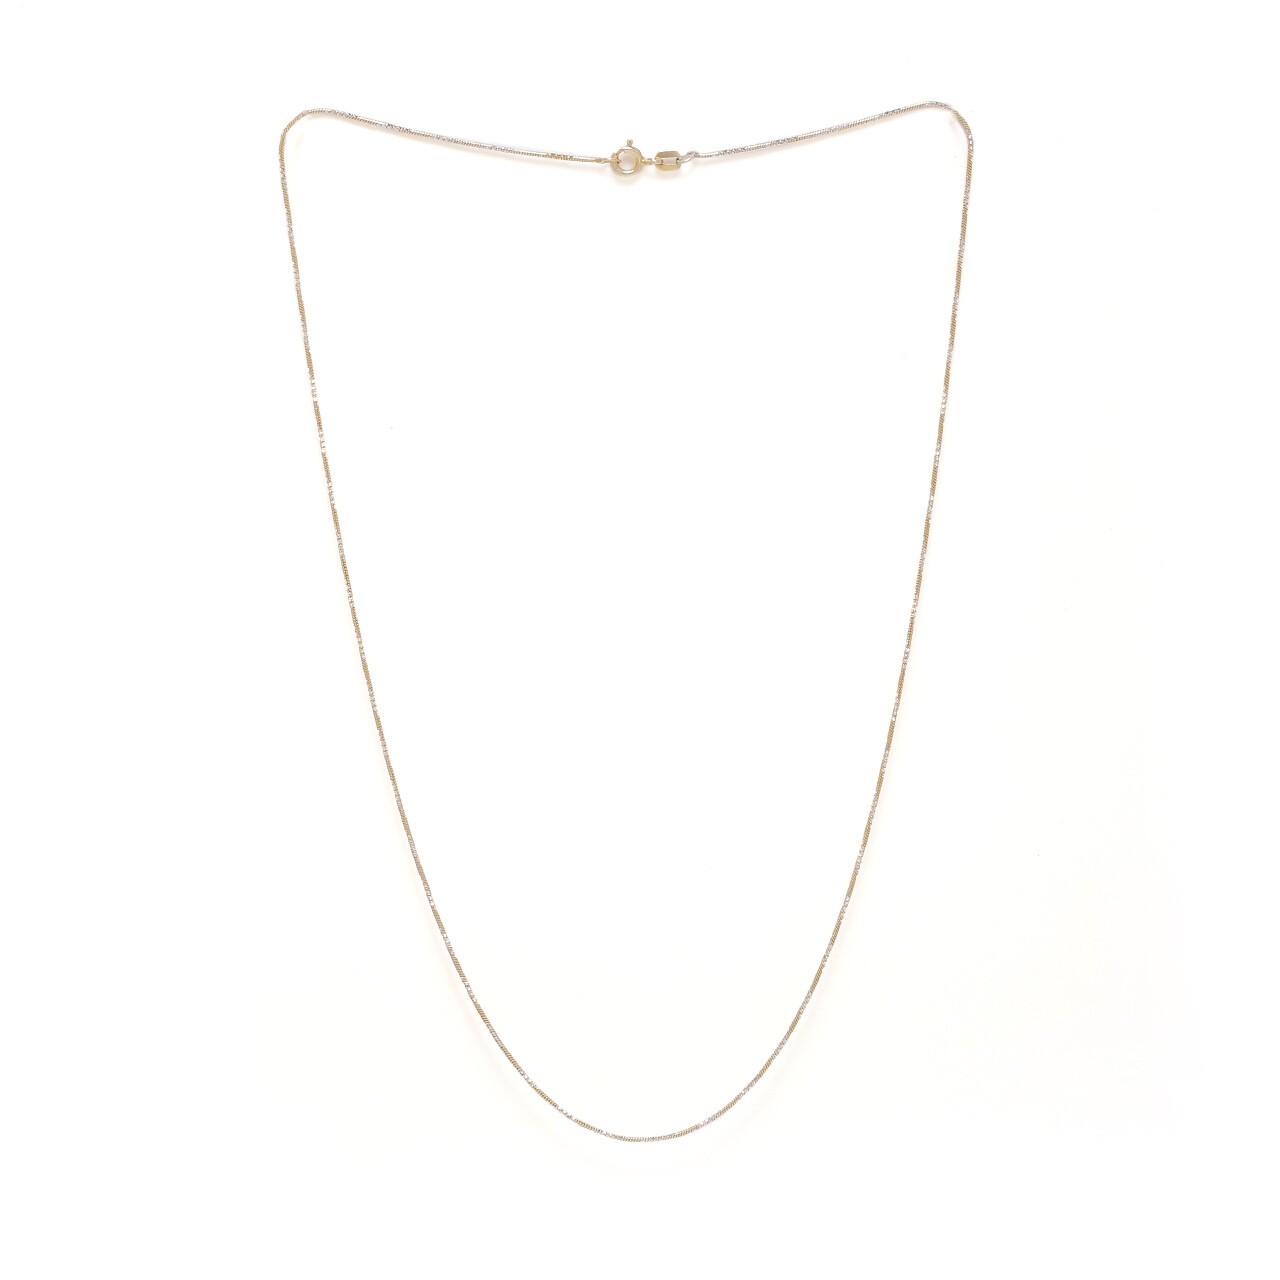 IndusDiva Laser Cut Italian Necklace Chain